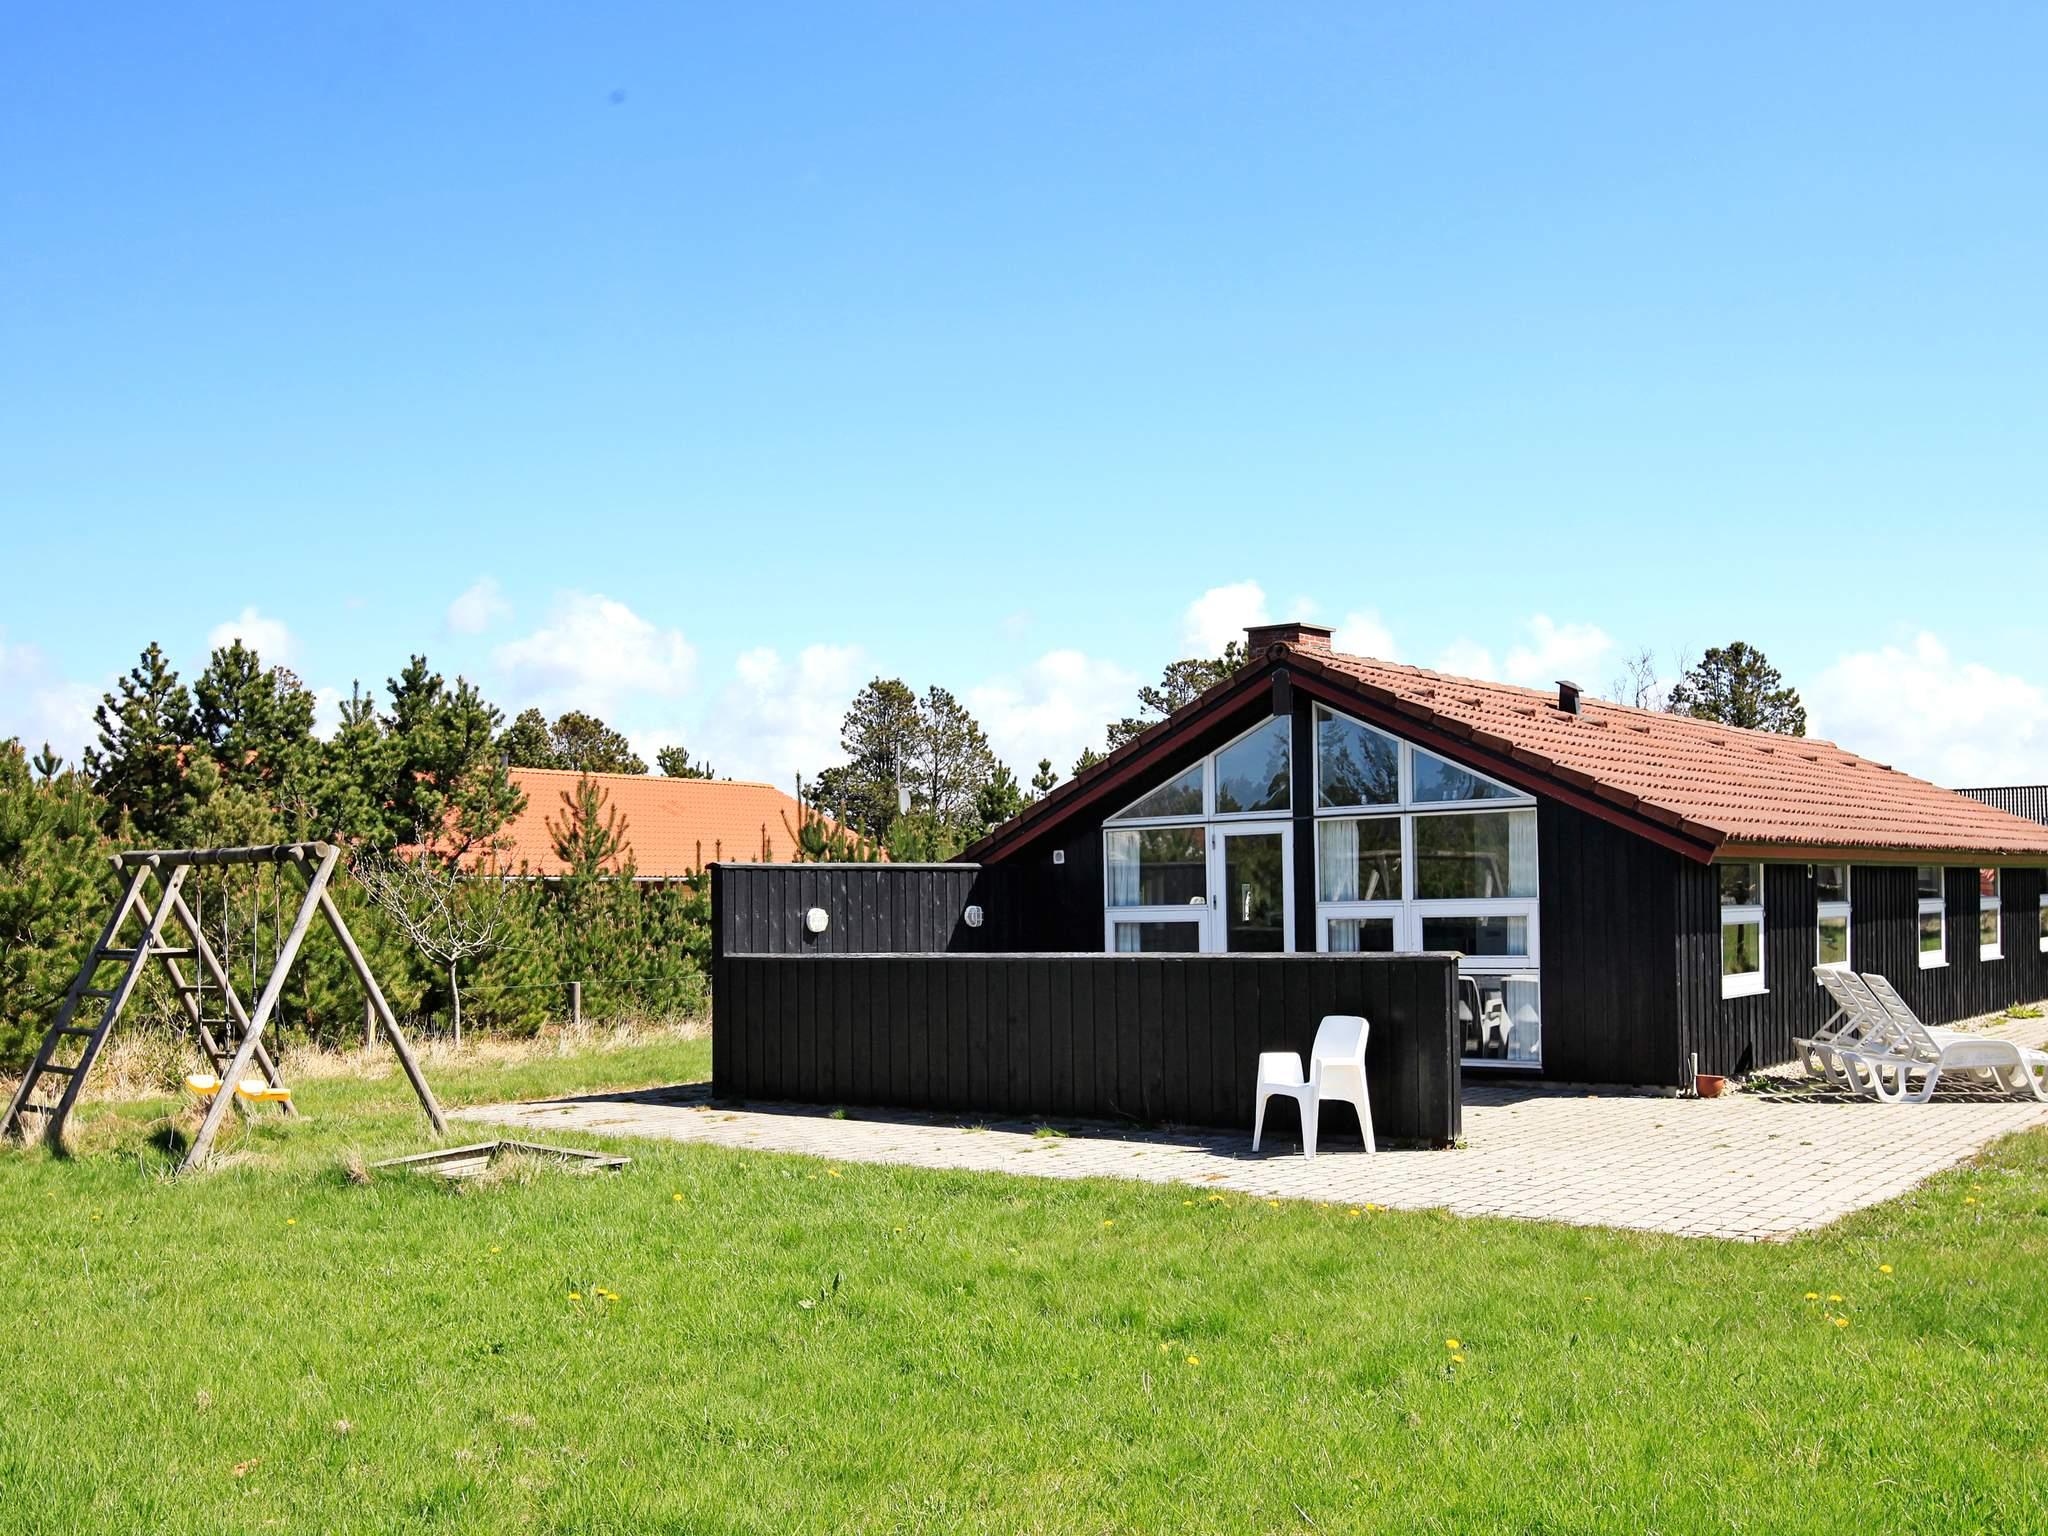 Ferienhaus Blåvand (88586), Blåvand, , Westjütland, Dänemark, Bild 1